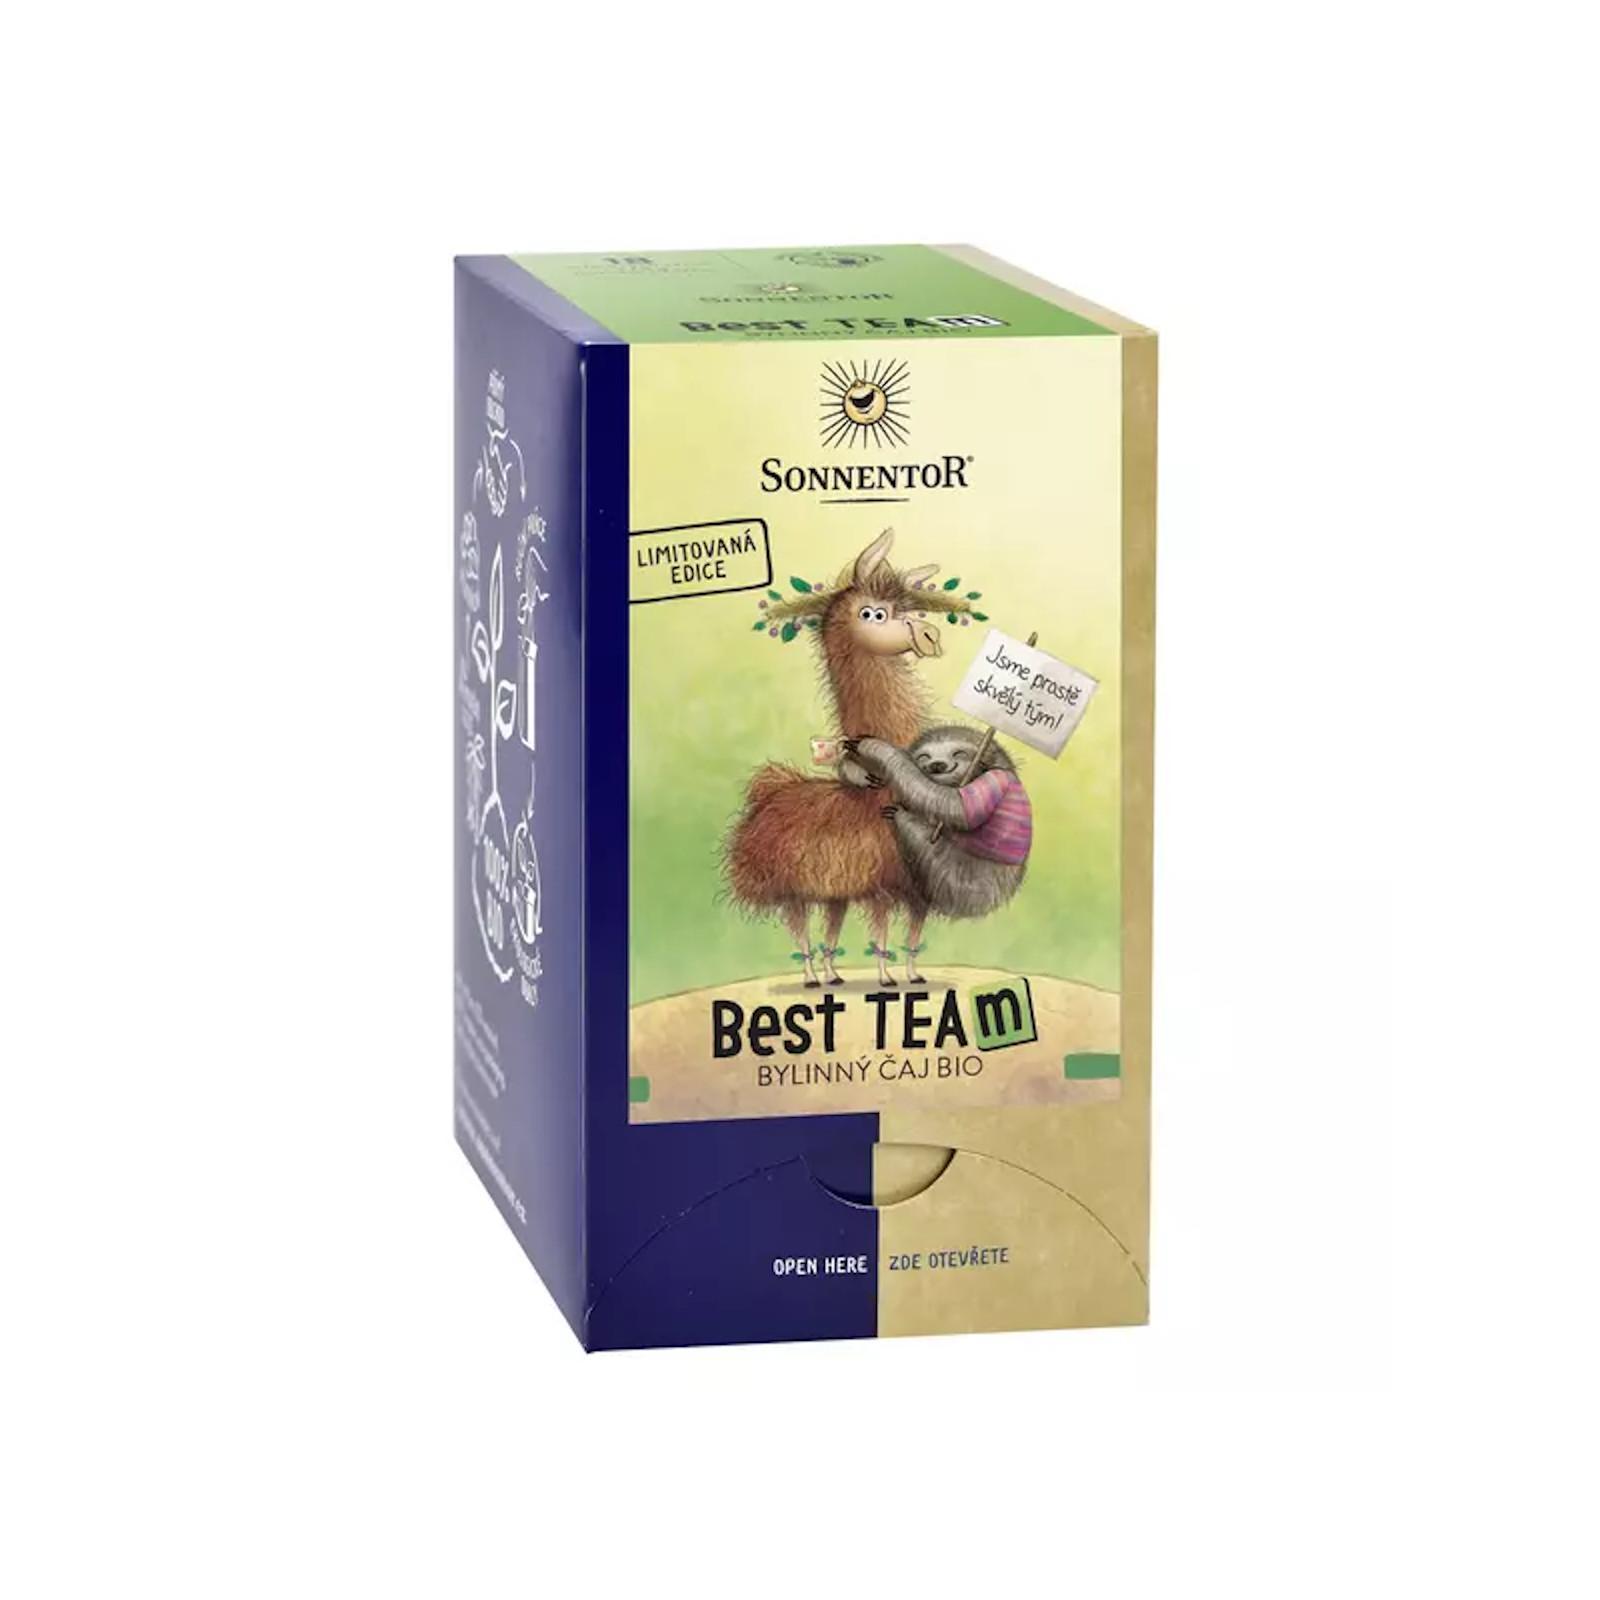 Sonnentor Best Team, bylinný čaj bio 32,4 g, 18 sáčků